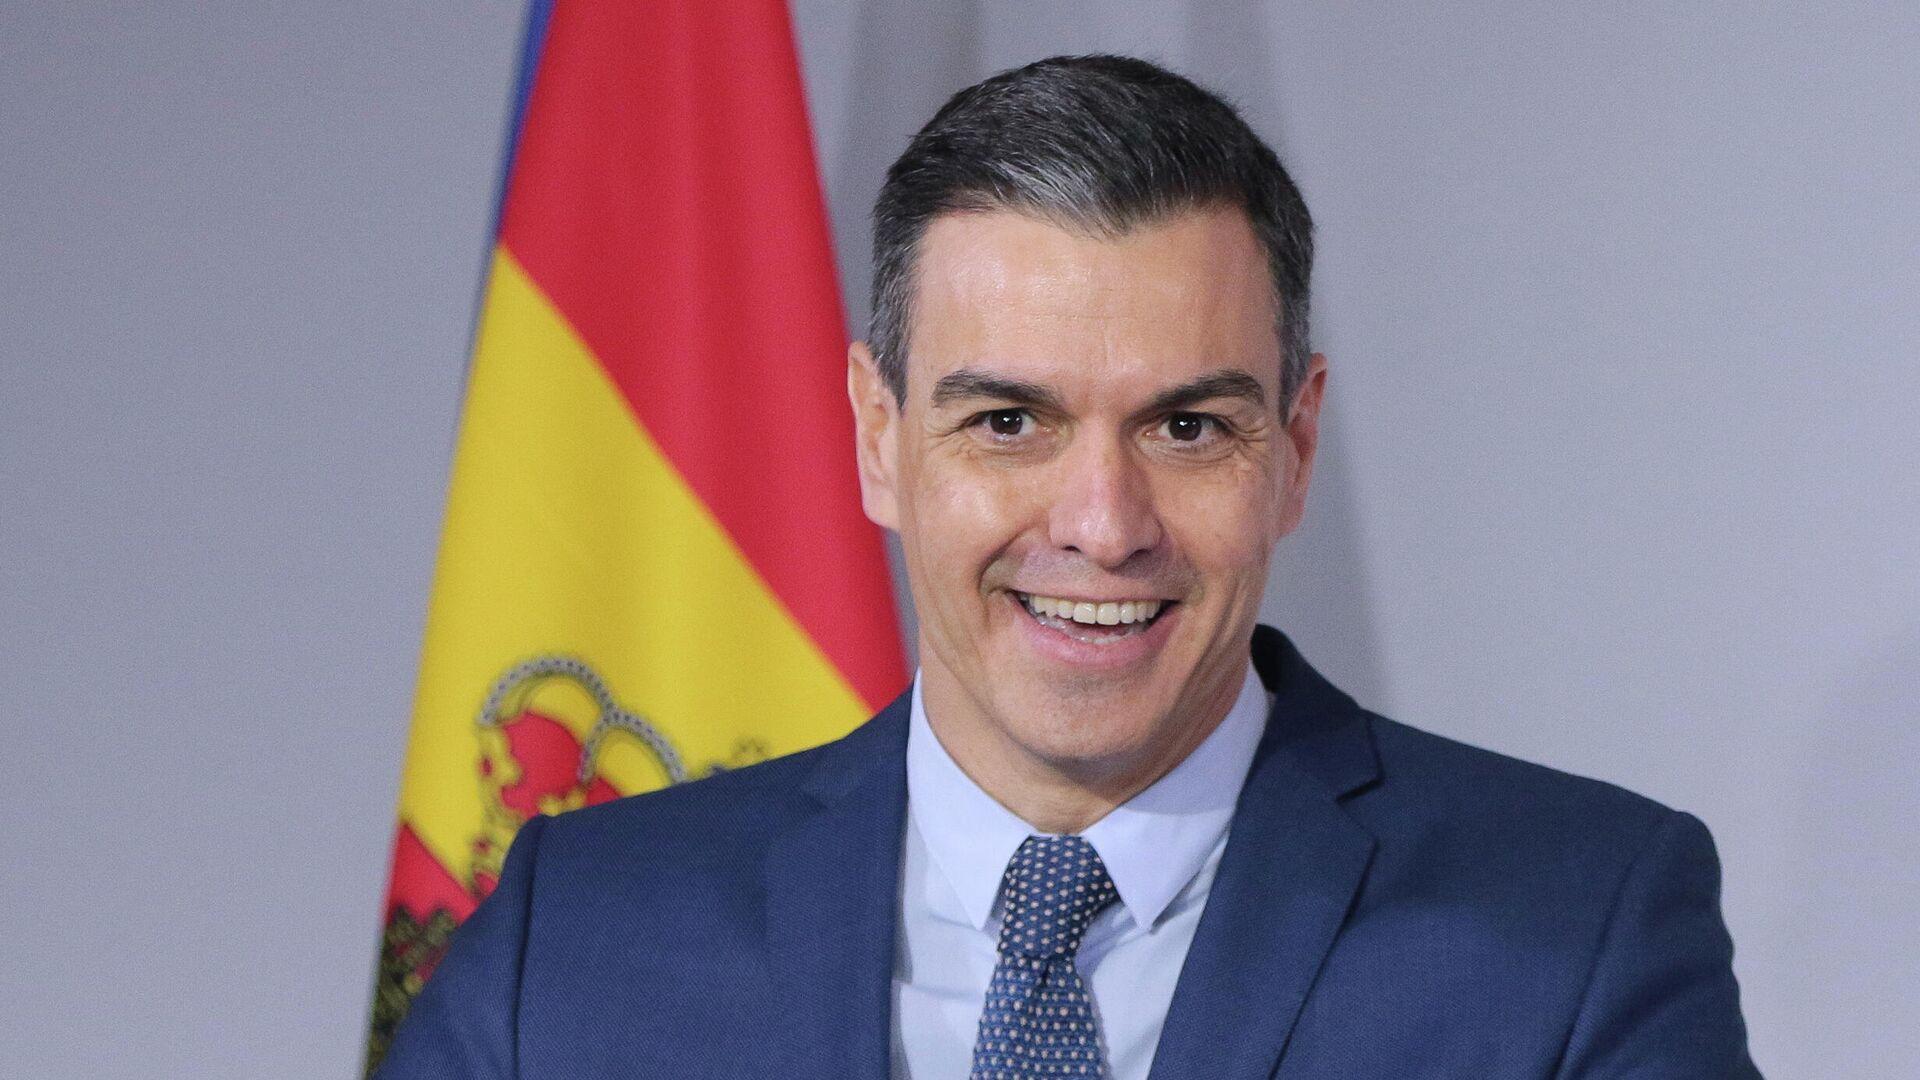 Pedro Sánchez, presidente del Gobierno de España - Sputnik Mundo, 1920, 26.04.2021